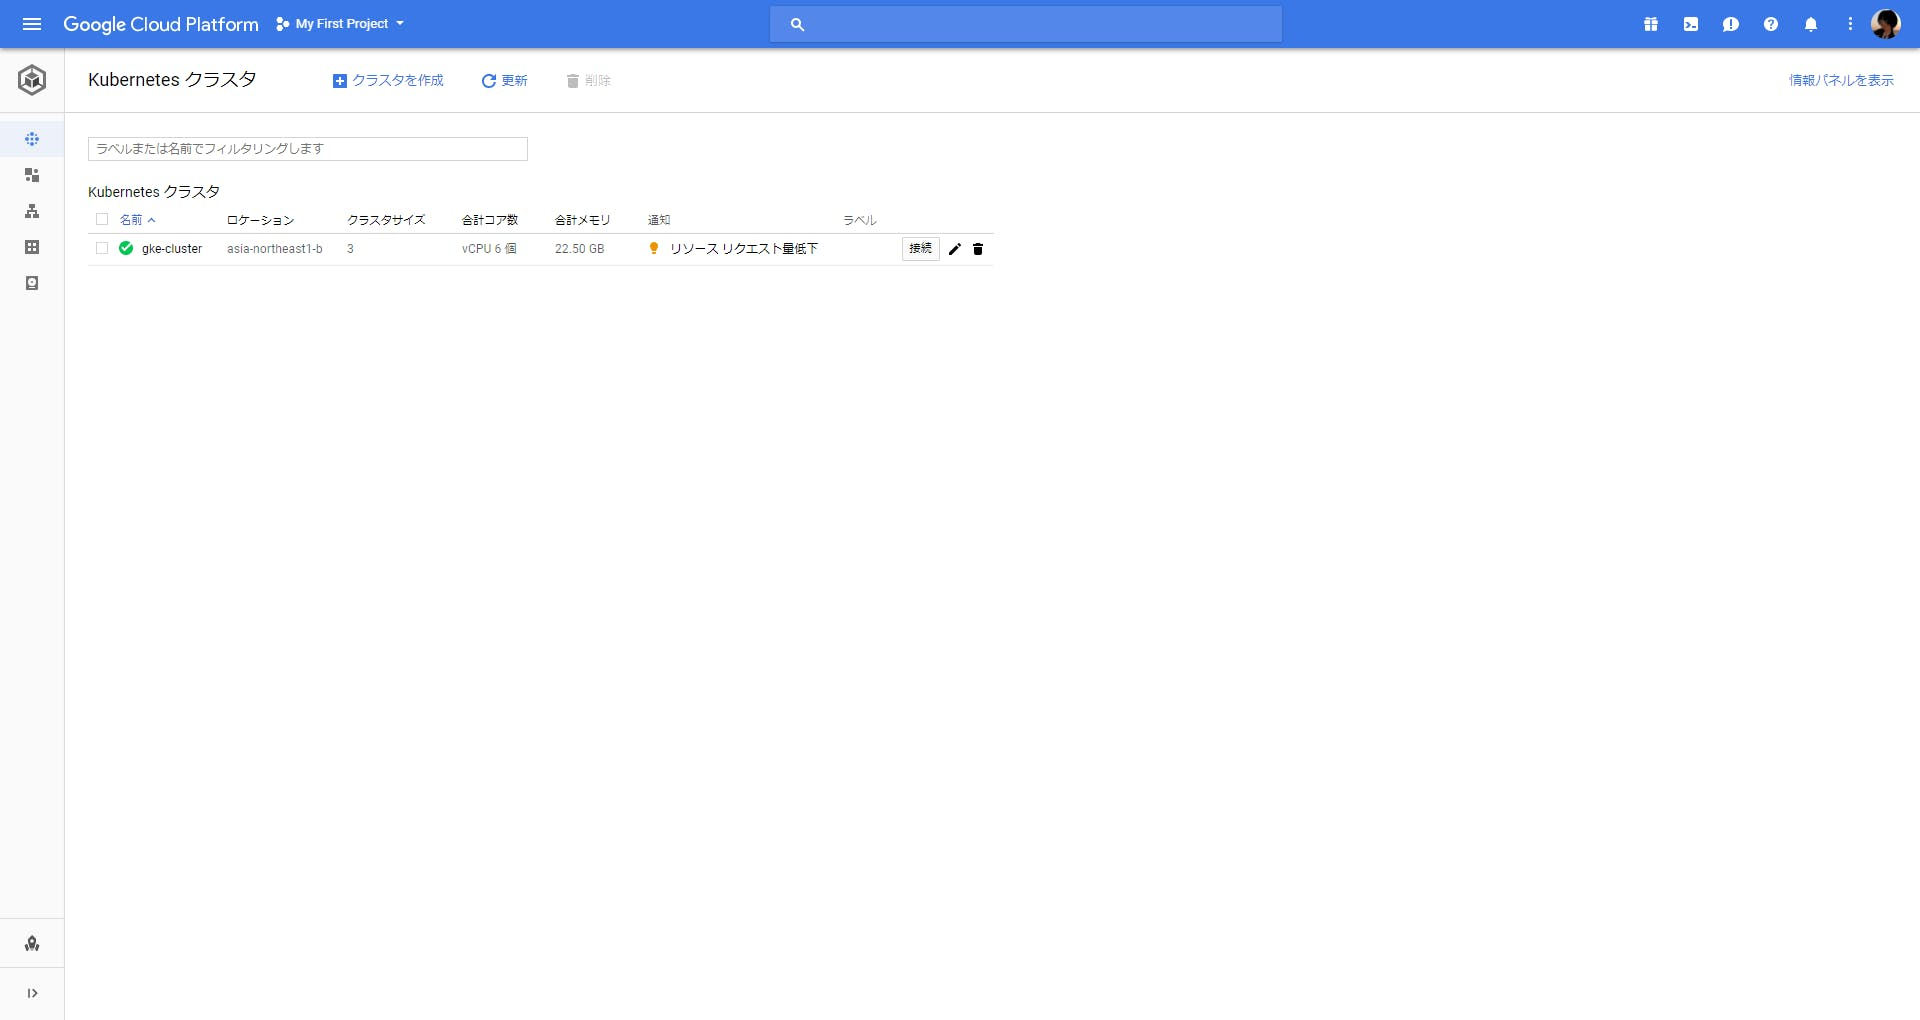 screencapture-console-cloud-google-kubernetes-list-2018-03-14-00_05_03.png